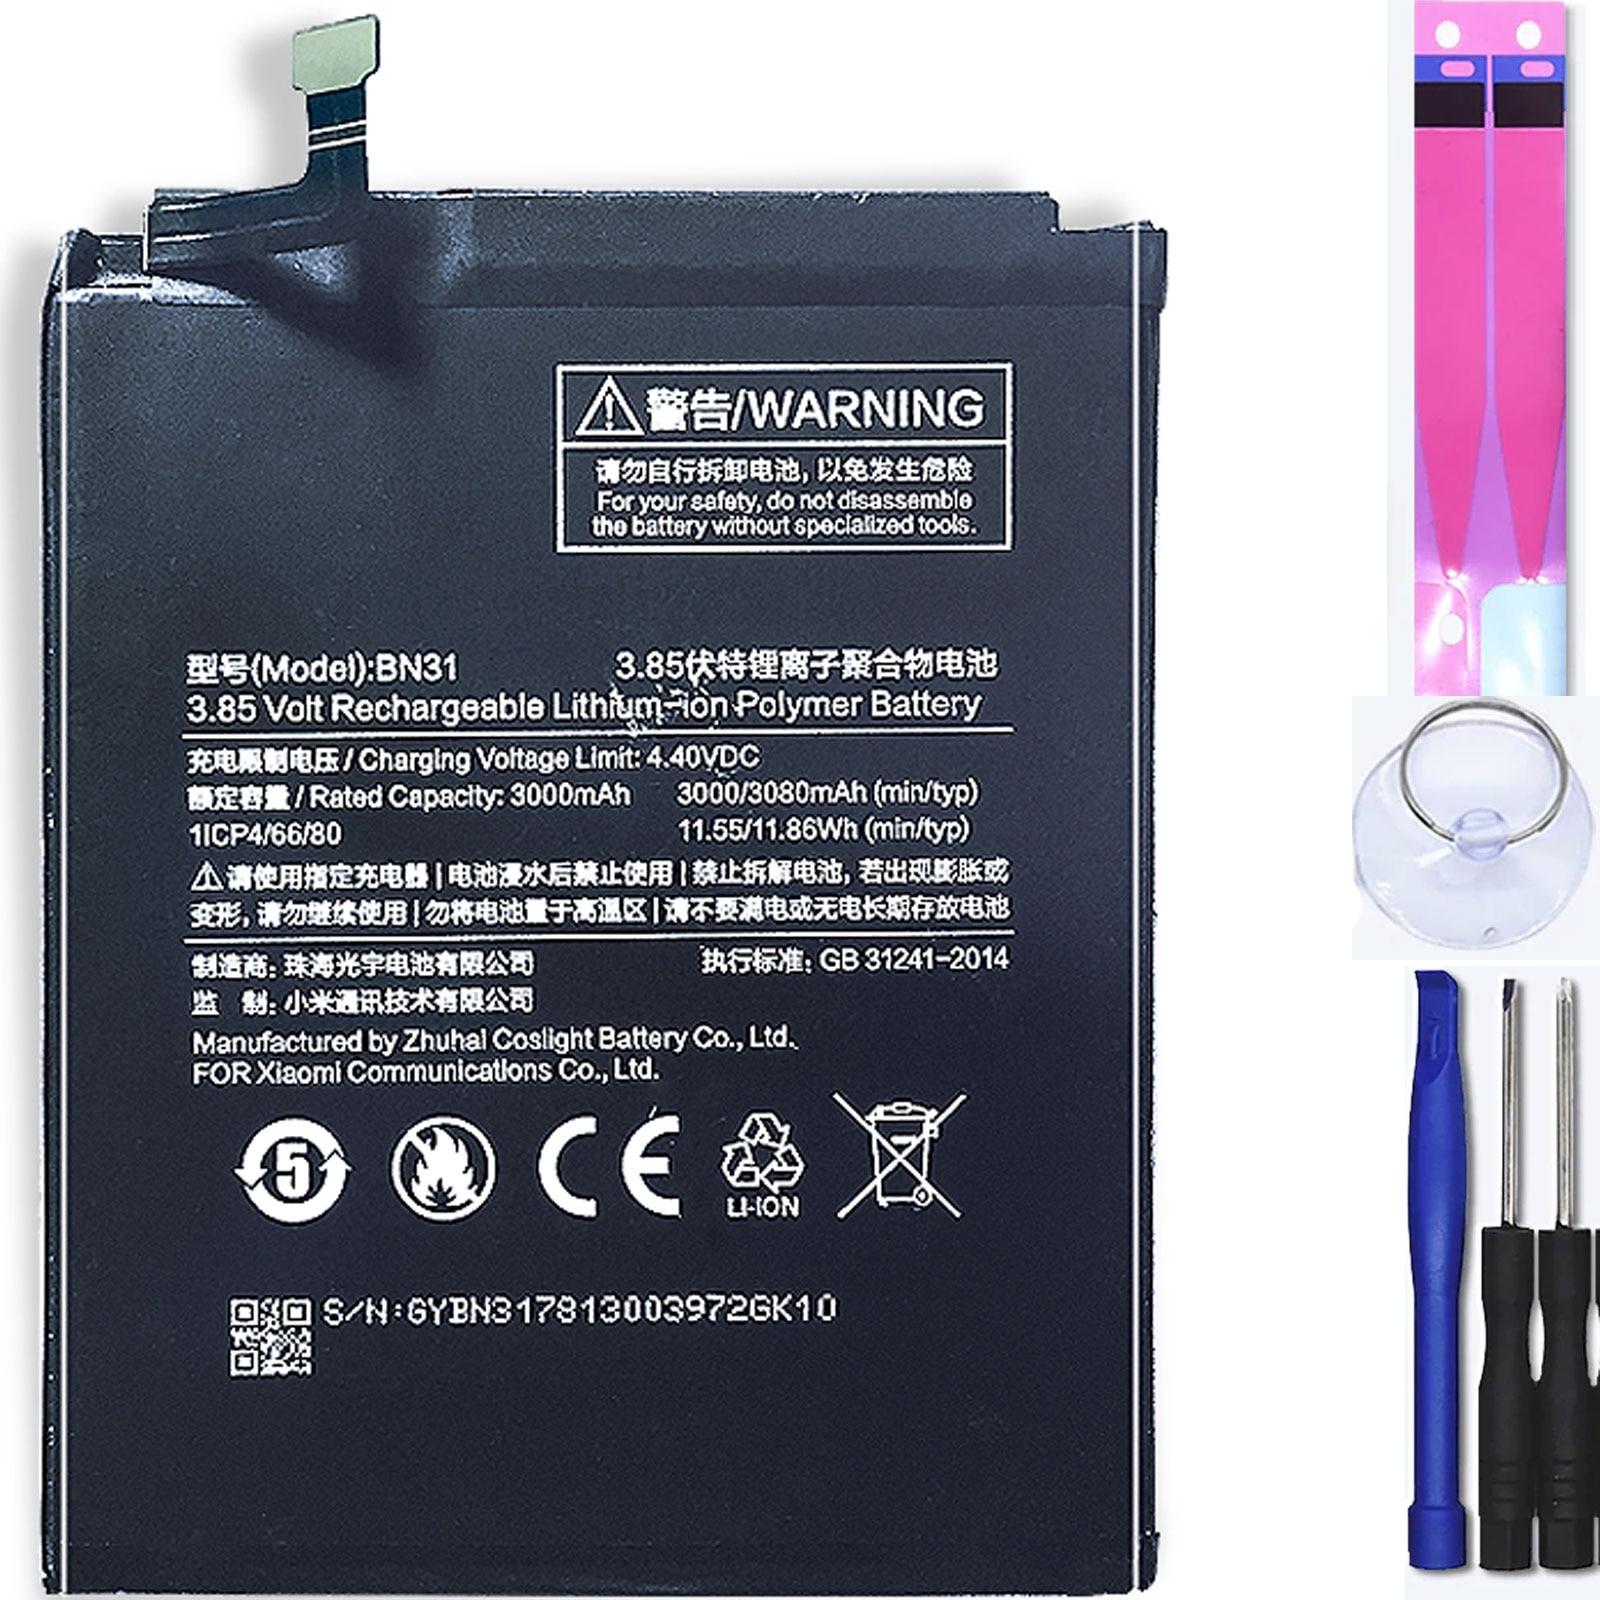 Аккумулятор для Xiaomi Mi A1 Redmi S2 Note 5A 5X 5A Pro S2 Y1 , Mpn Оригинал: Bn31